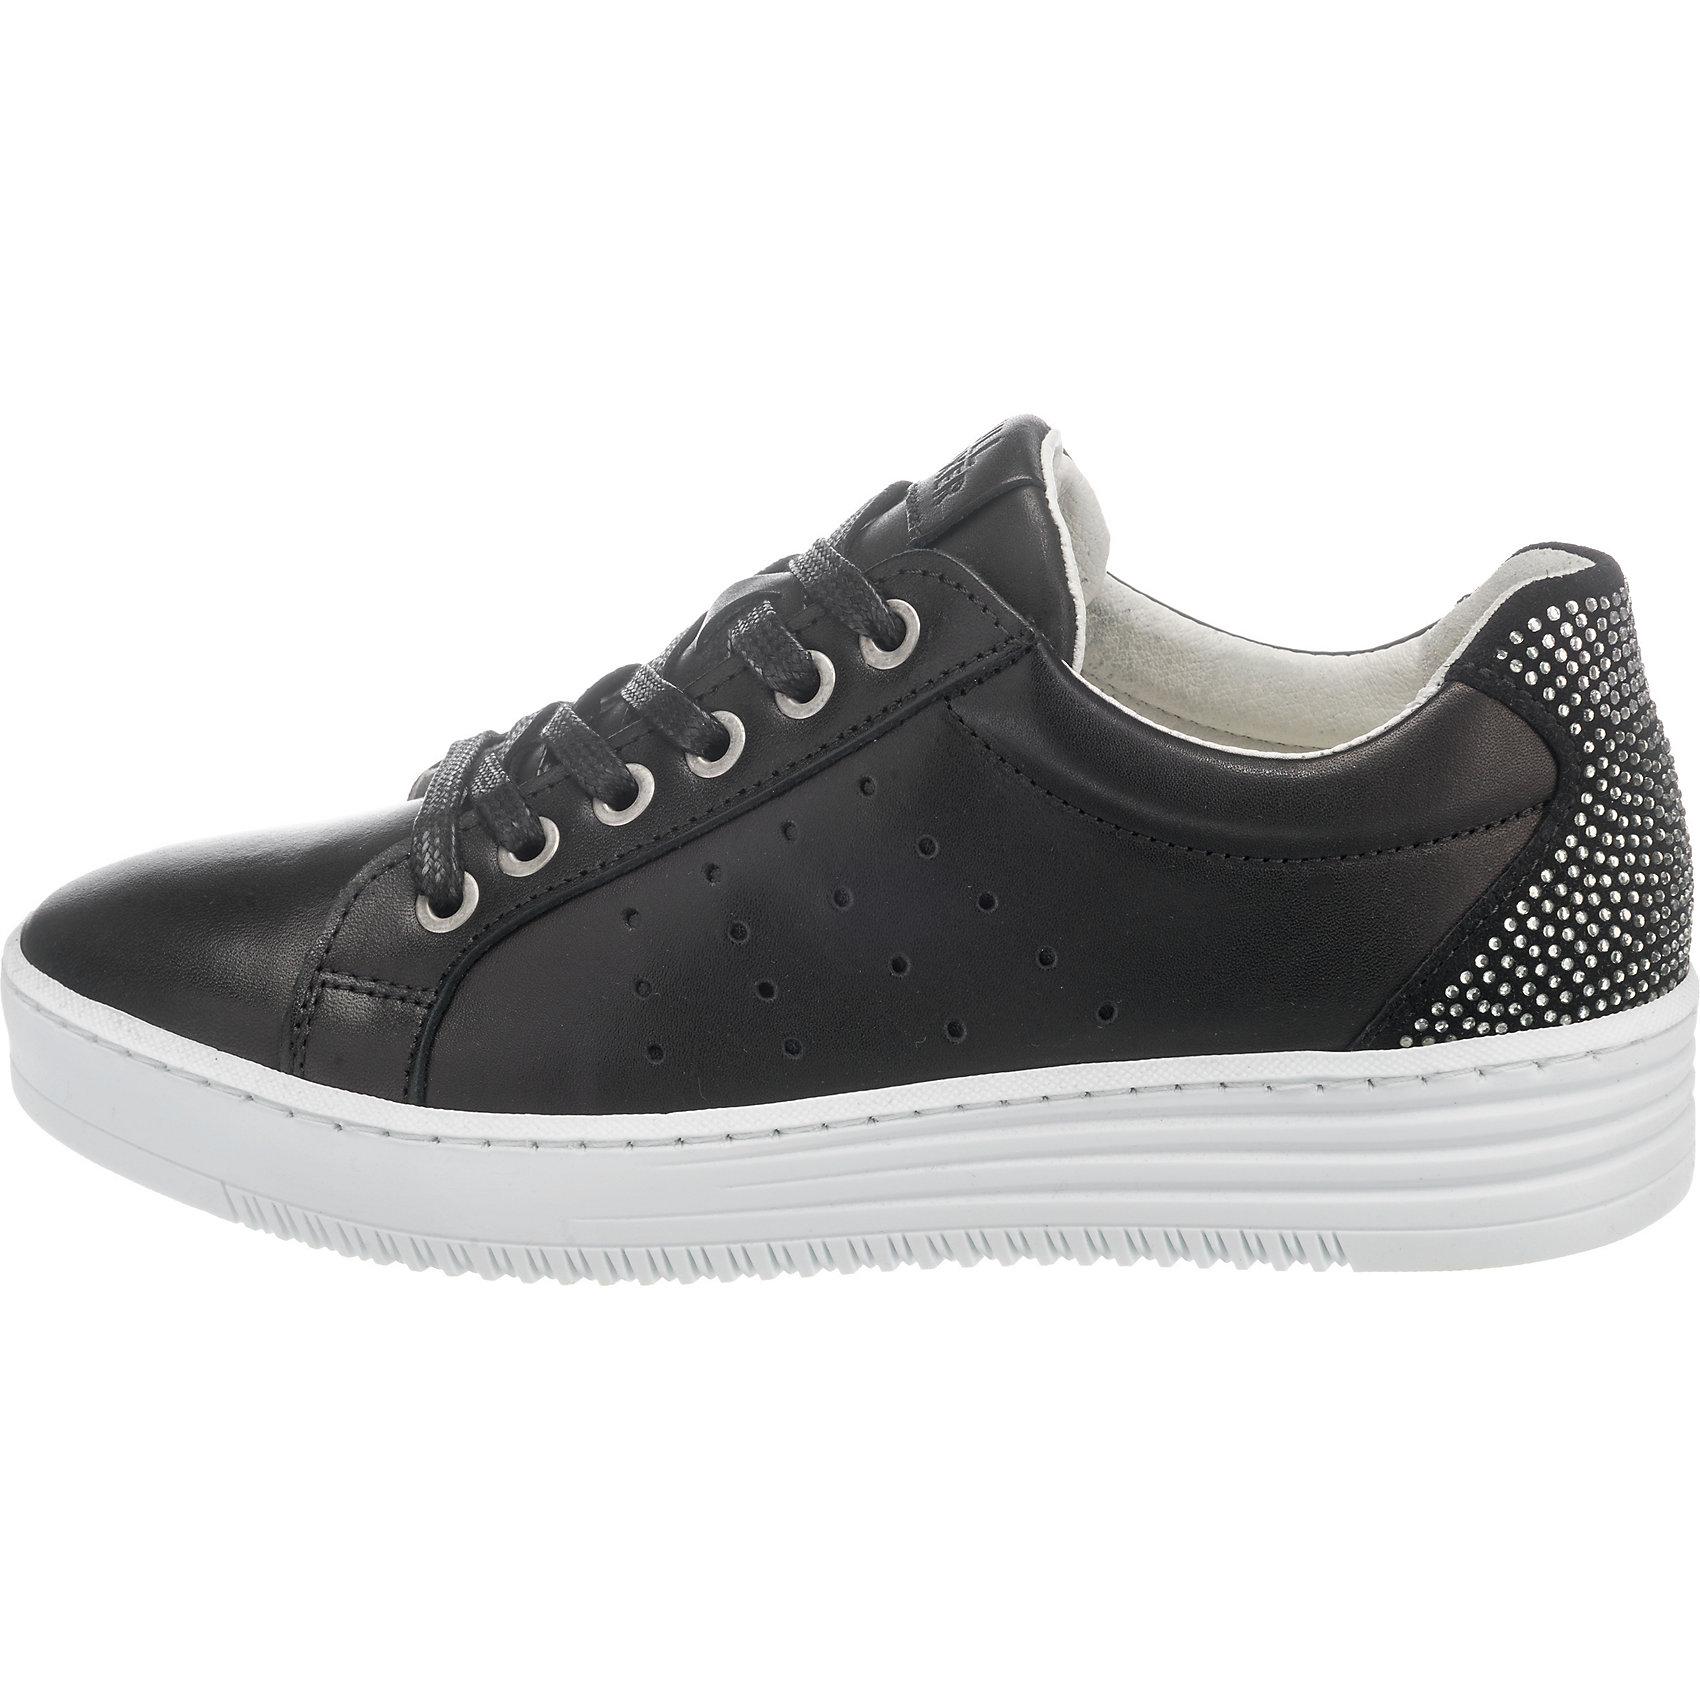 Neu BULLBOXER Sneakers Niedrig 7409442 7409442 Niedrig für Damen schwarz weiß ae8f11